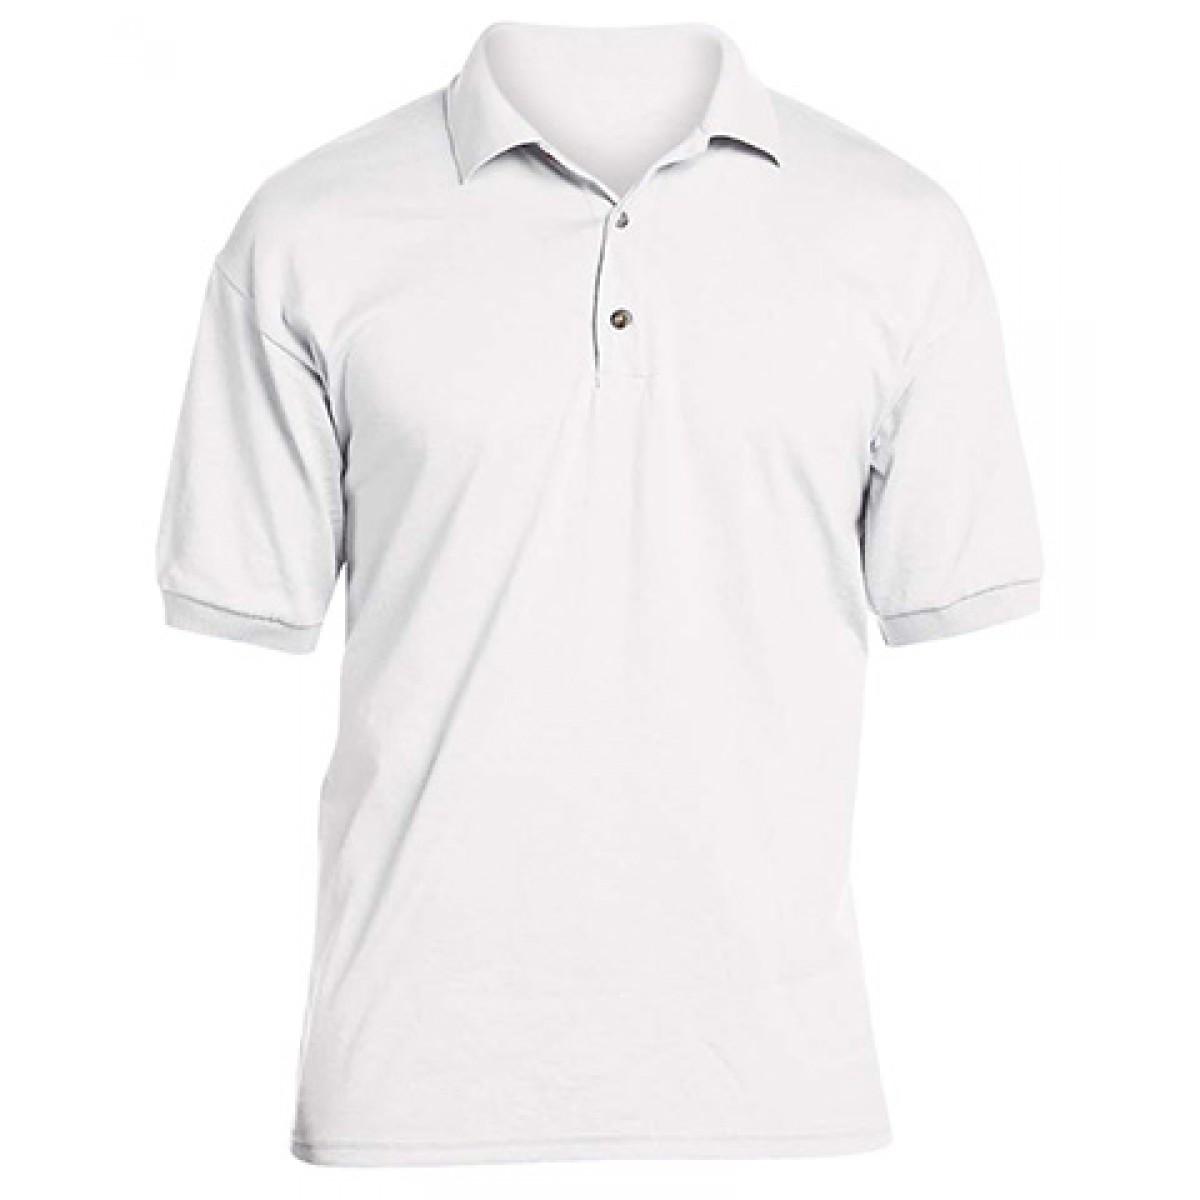 Jersey Polo 50/50 -White-YL